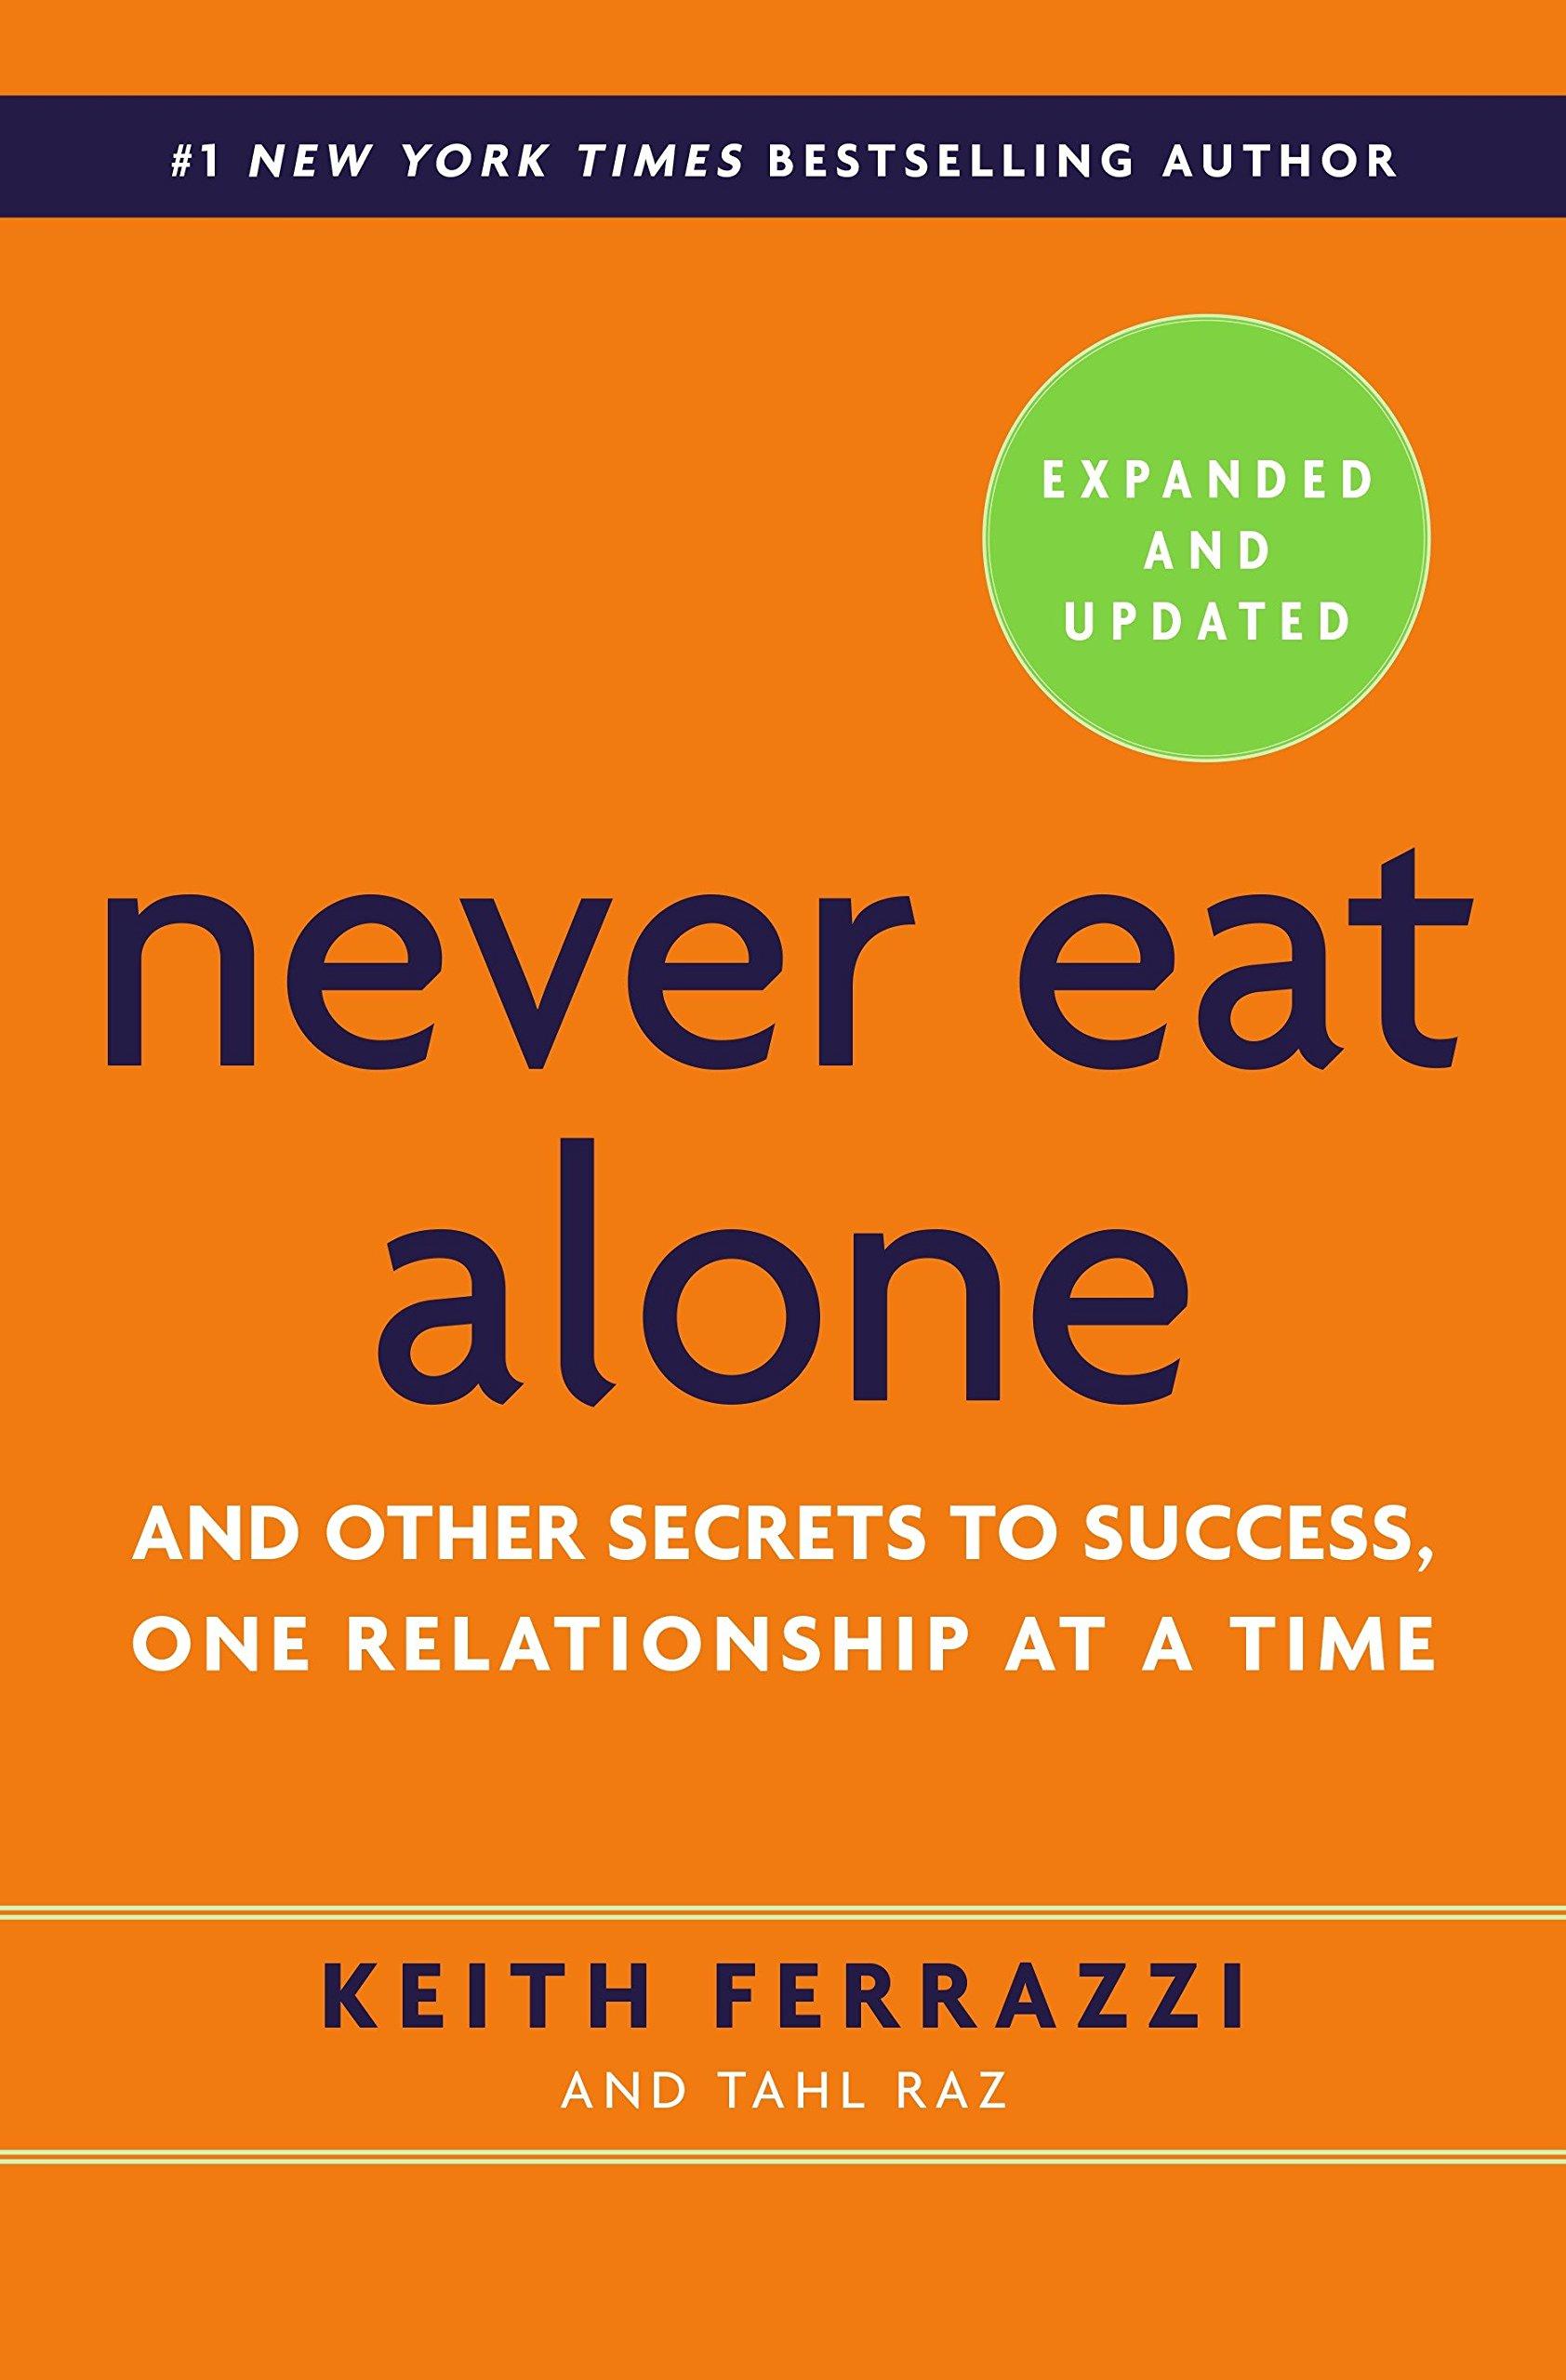 Never Eat Alone (Keith Ferrazzi)